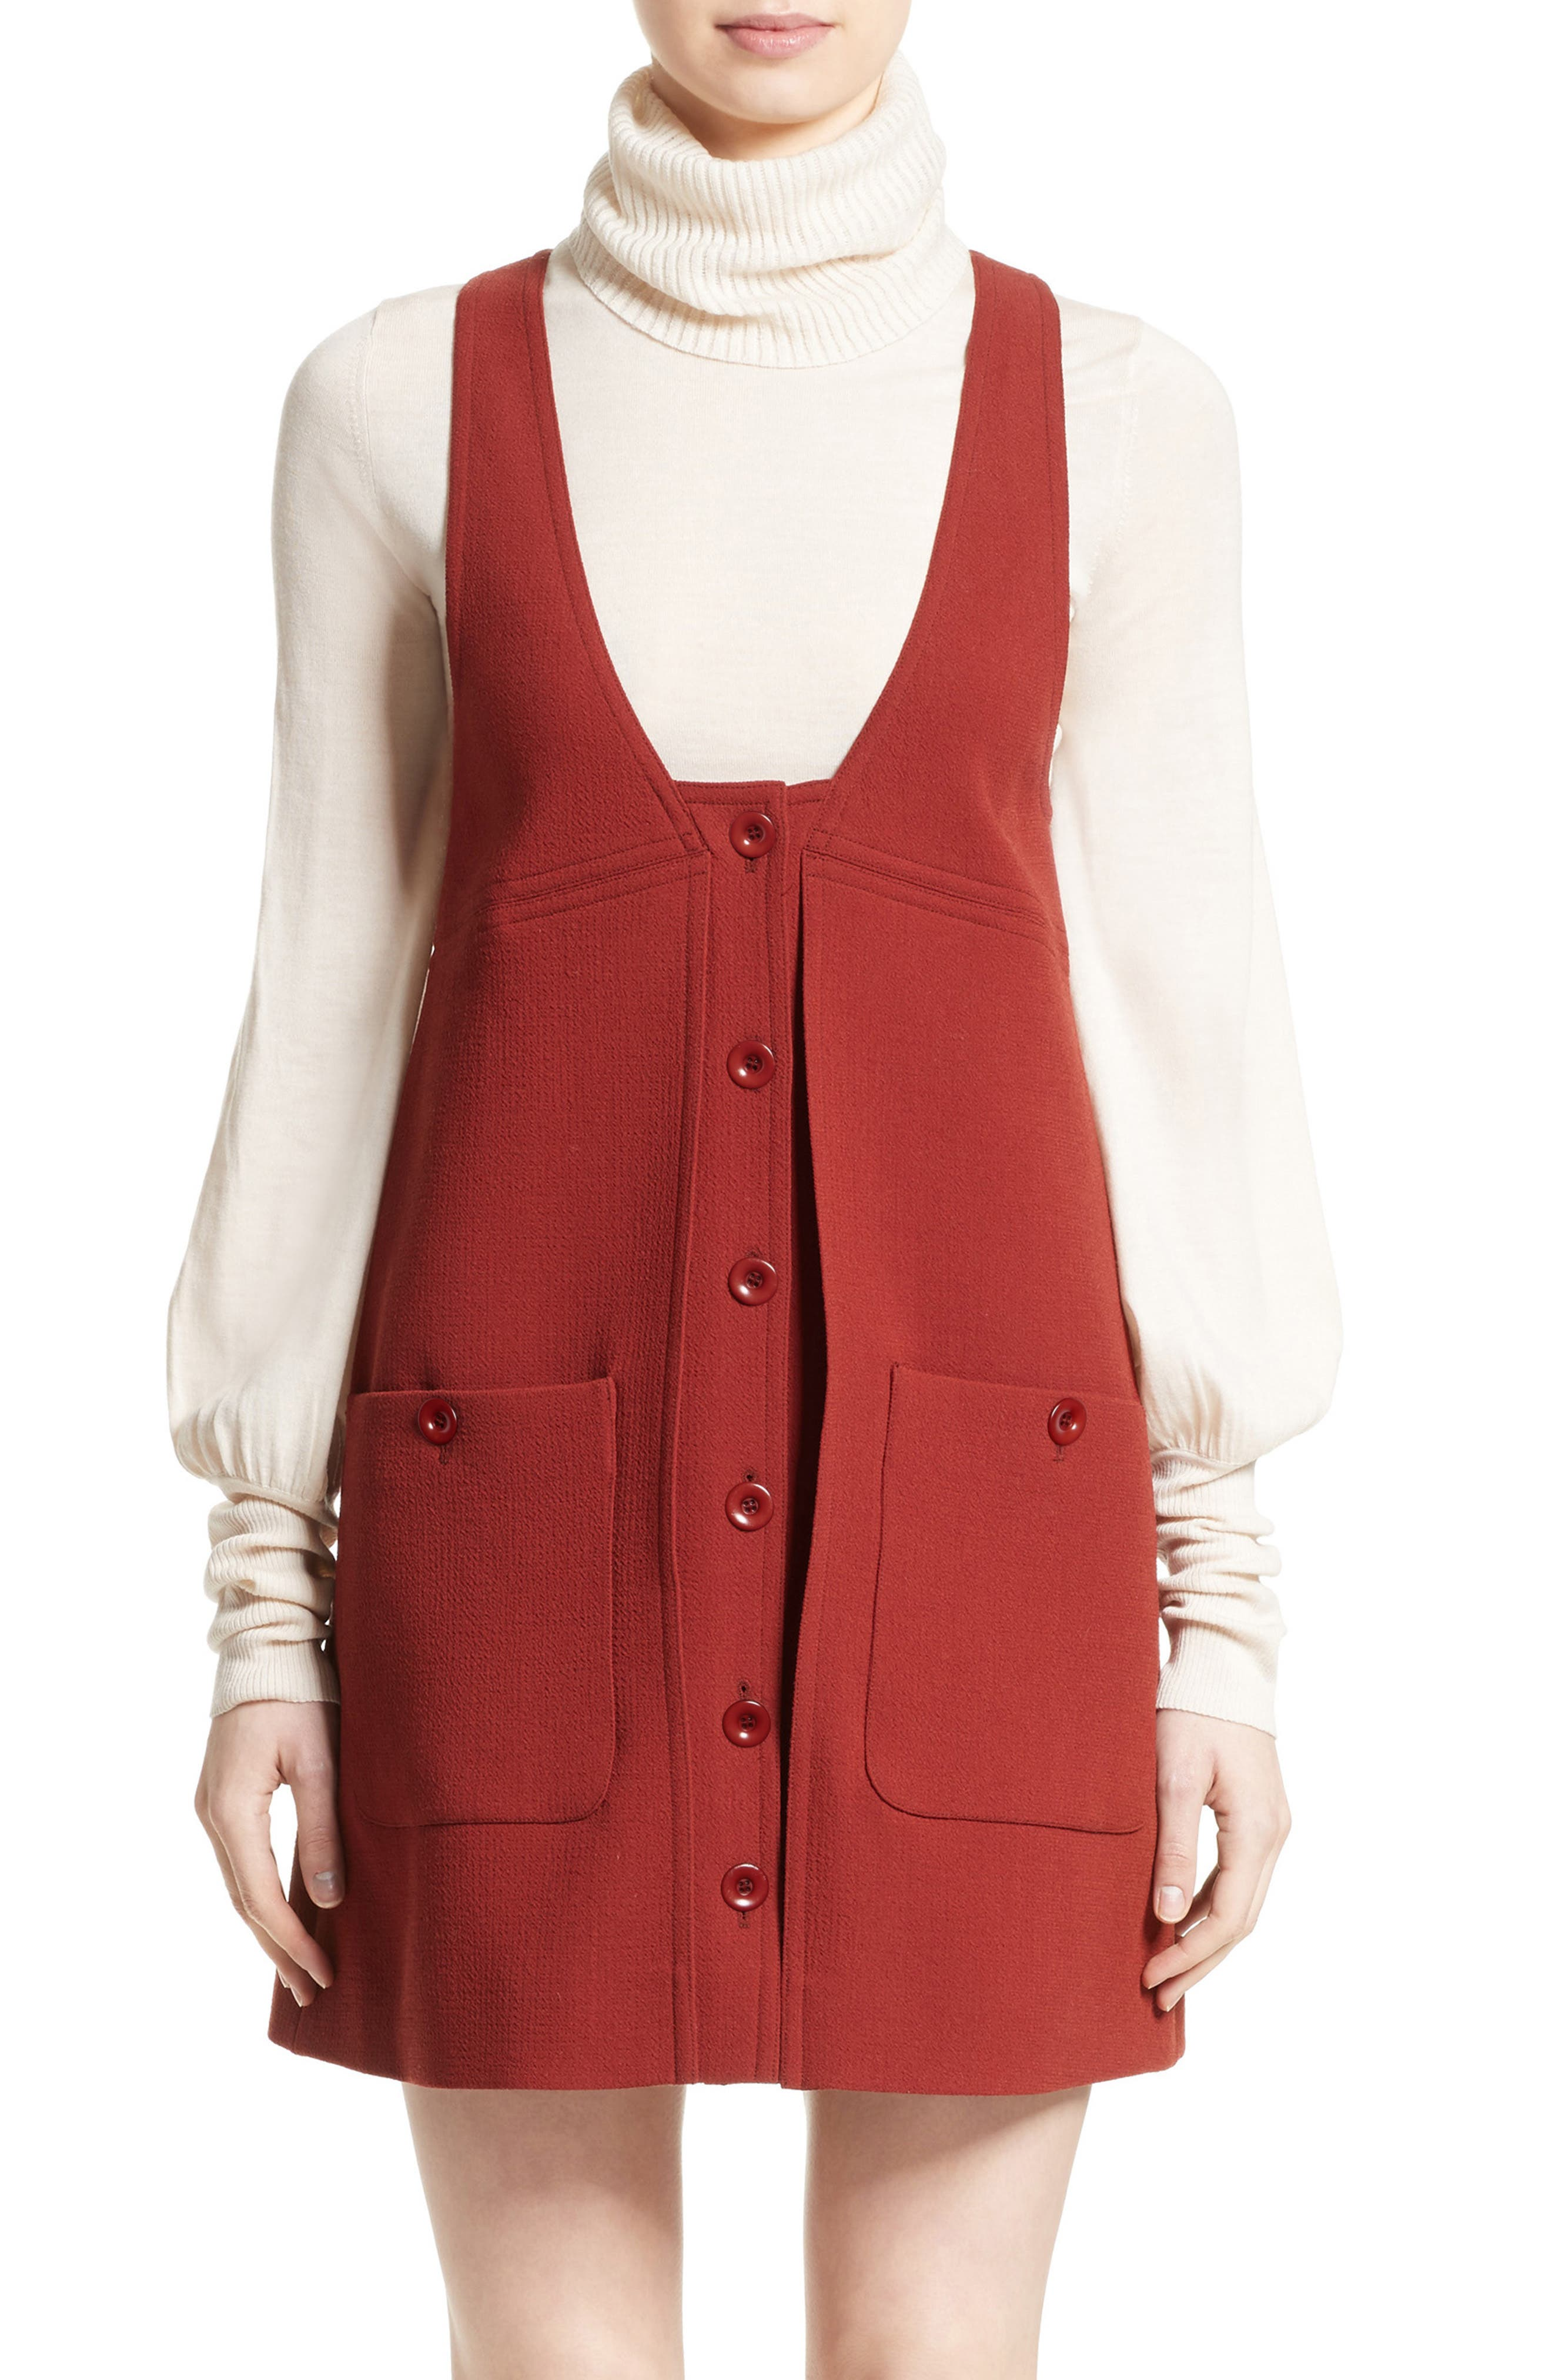 Alternate Image 1 Selected - Chloé Wool Crepe Jumper Dress